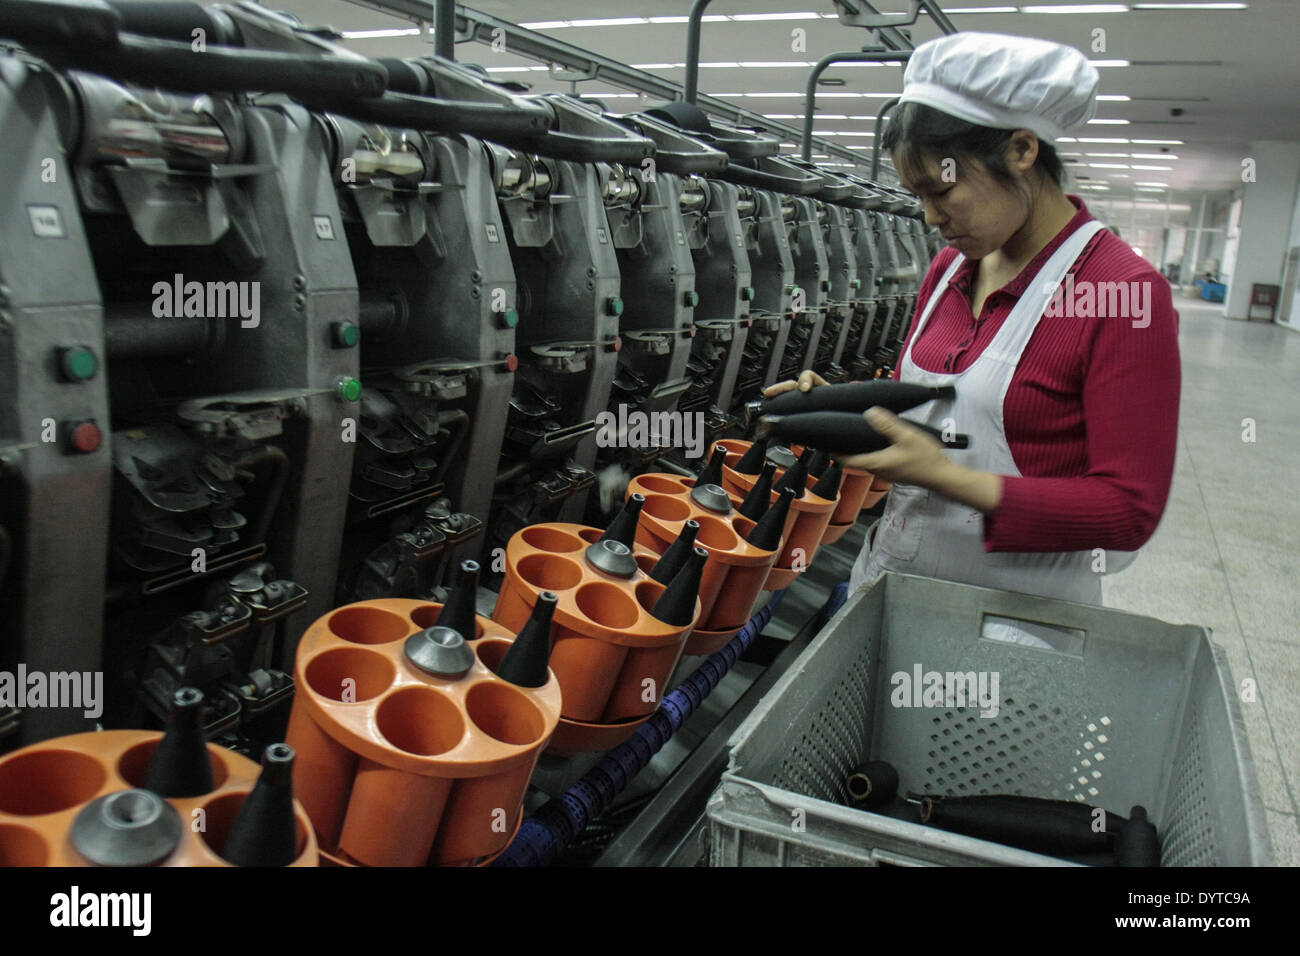 Workers operate a weaving machine at the Jiangsu Sunshine Co - Stock Image